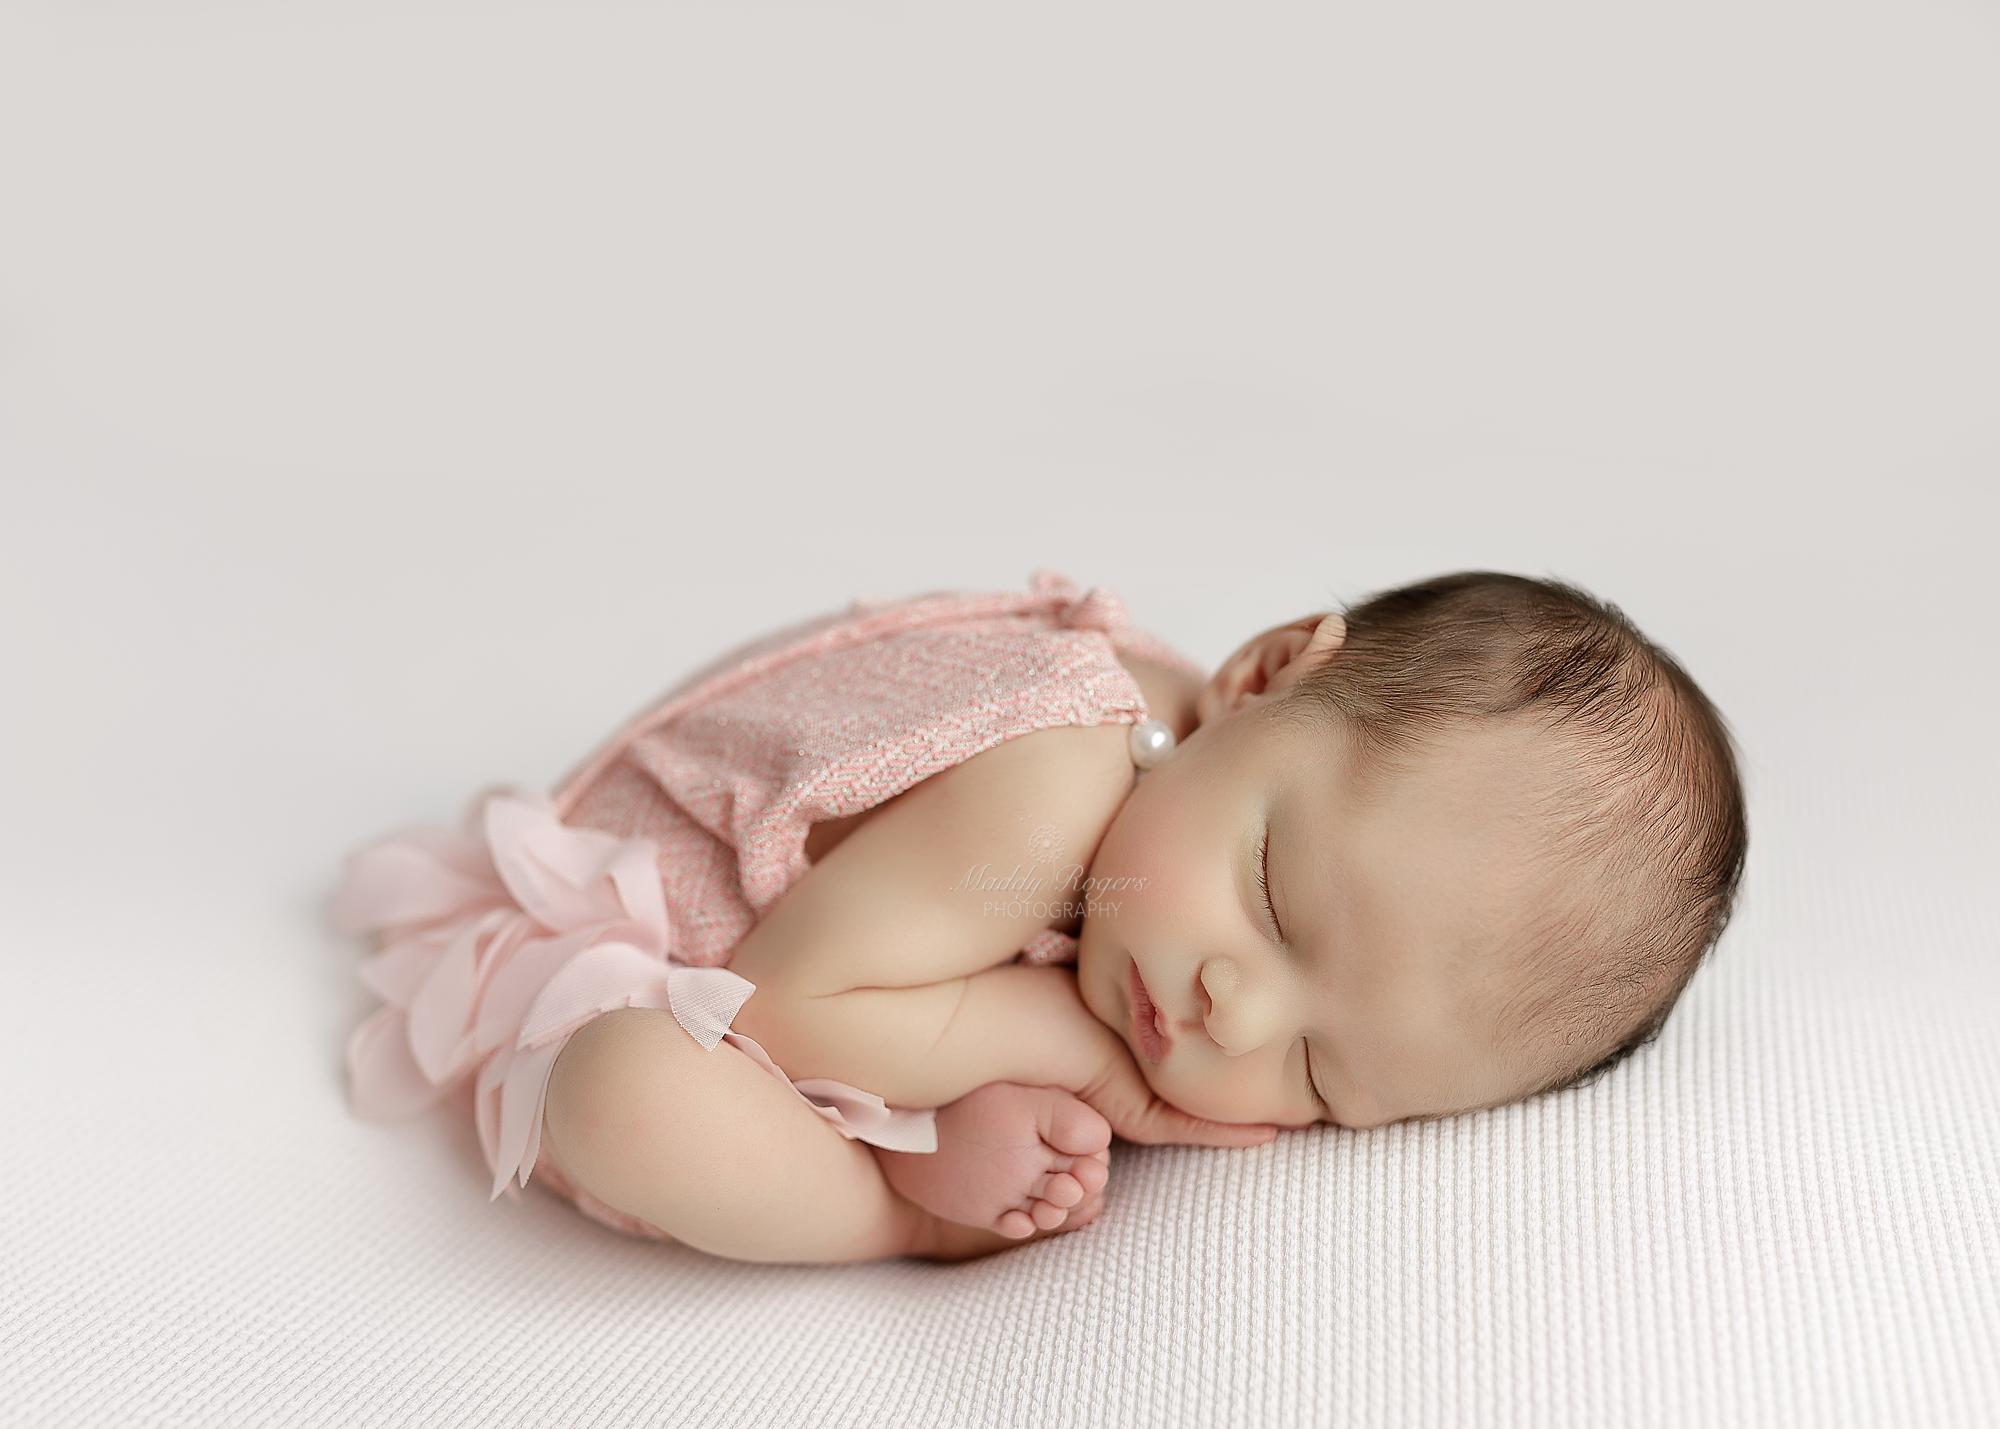 Newborn mentoring 11 training lincolnshire rebecca warwick